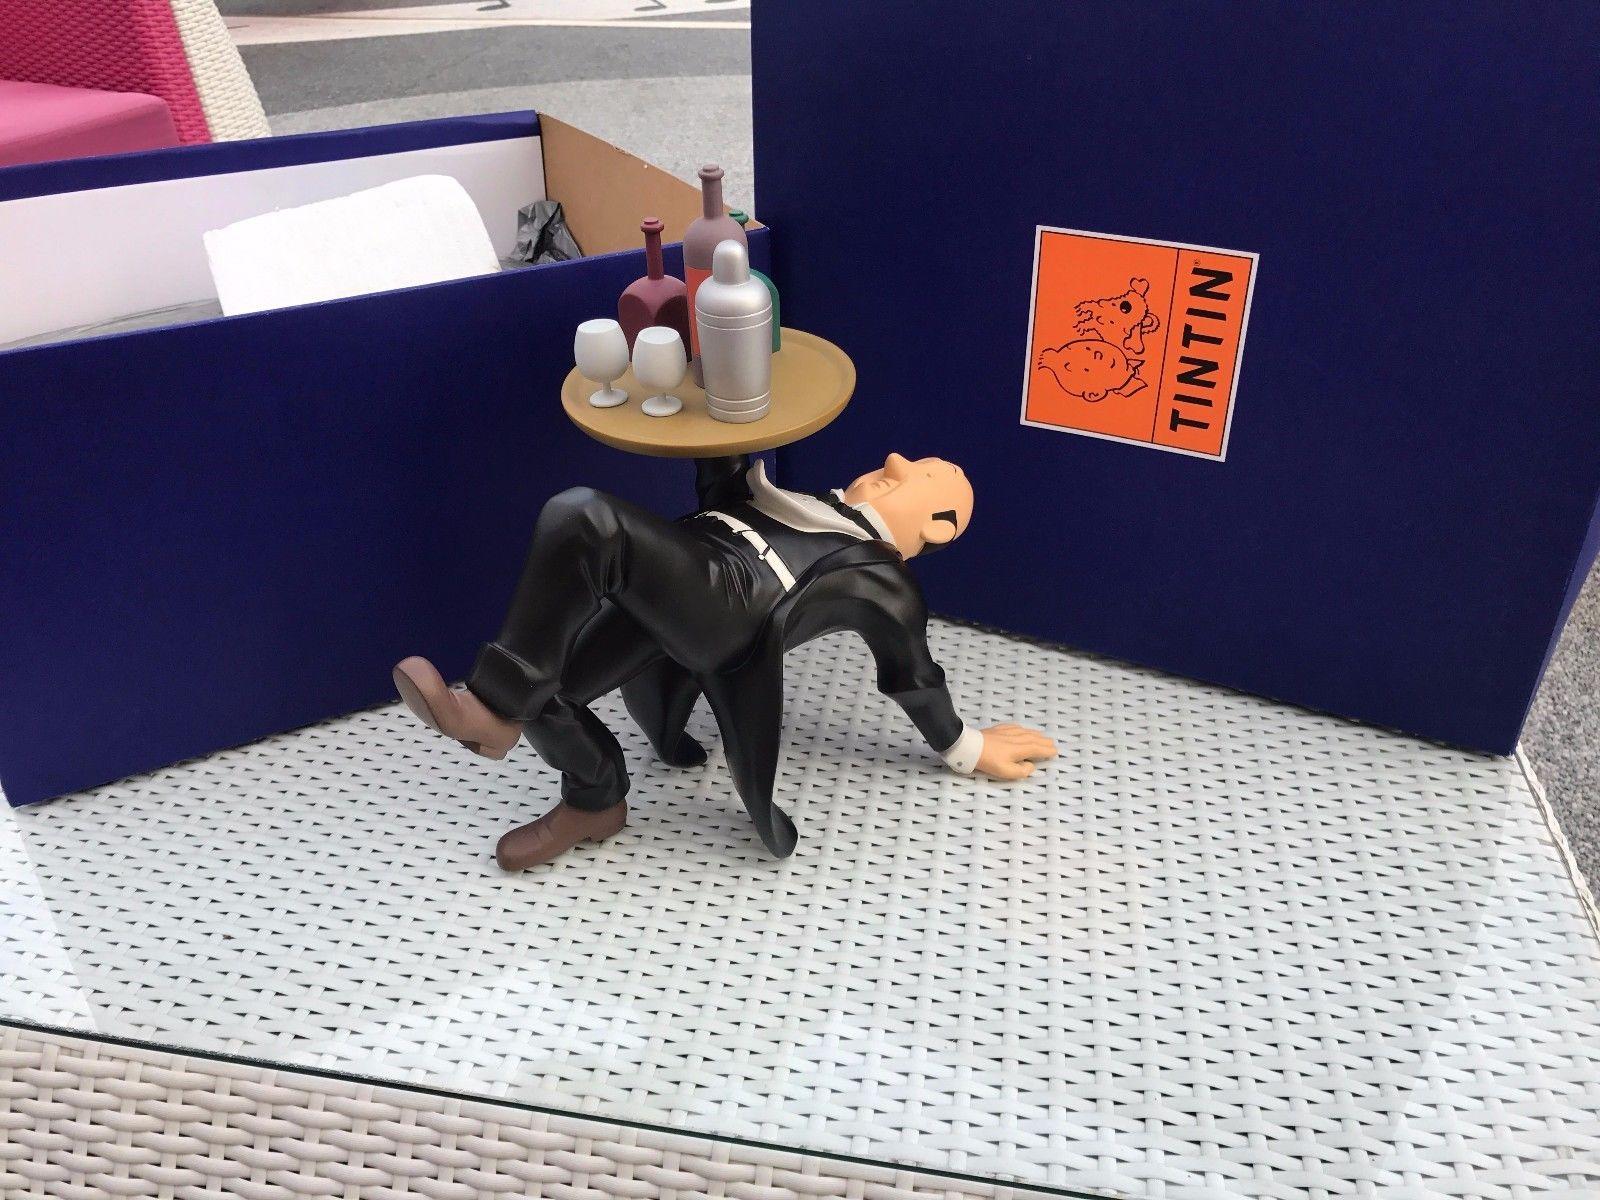 Tintin Moulinsart Nestor Plateau No Aroutcheff